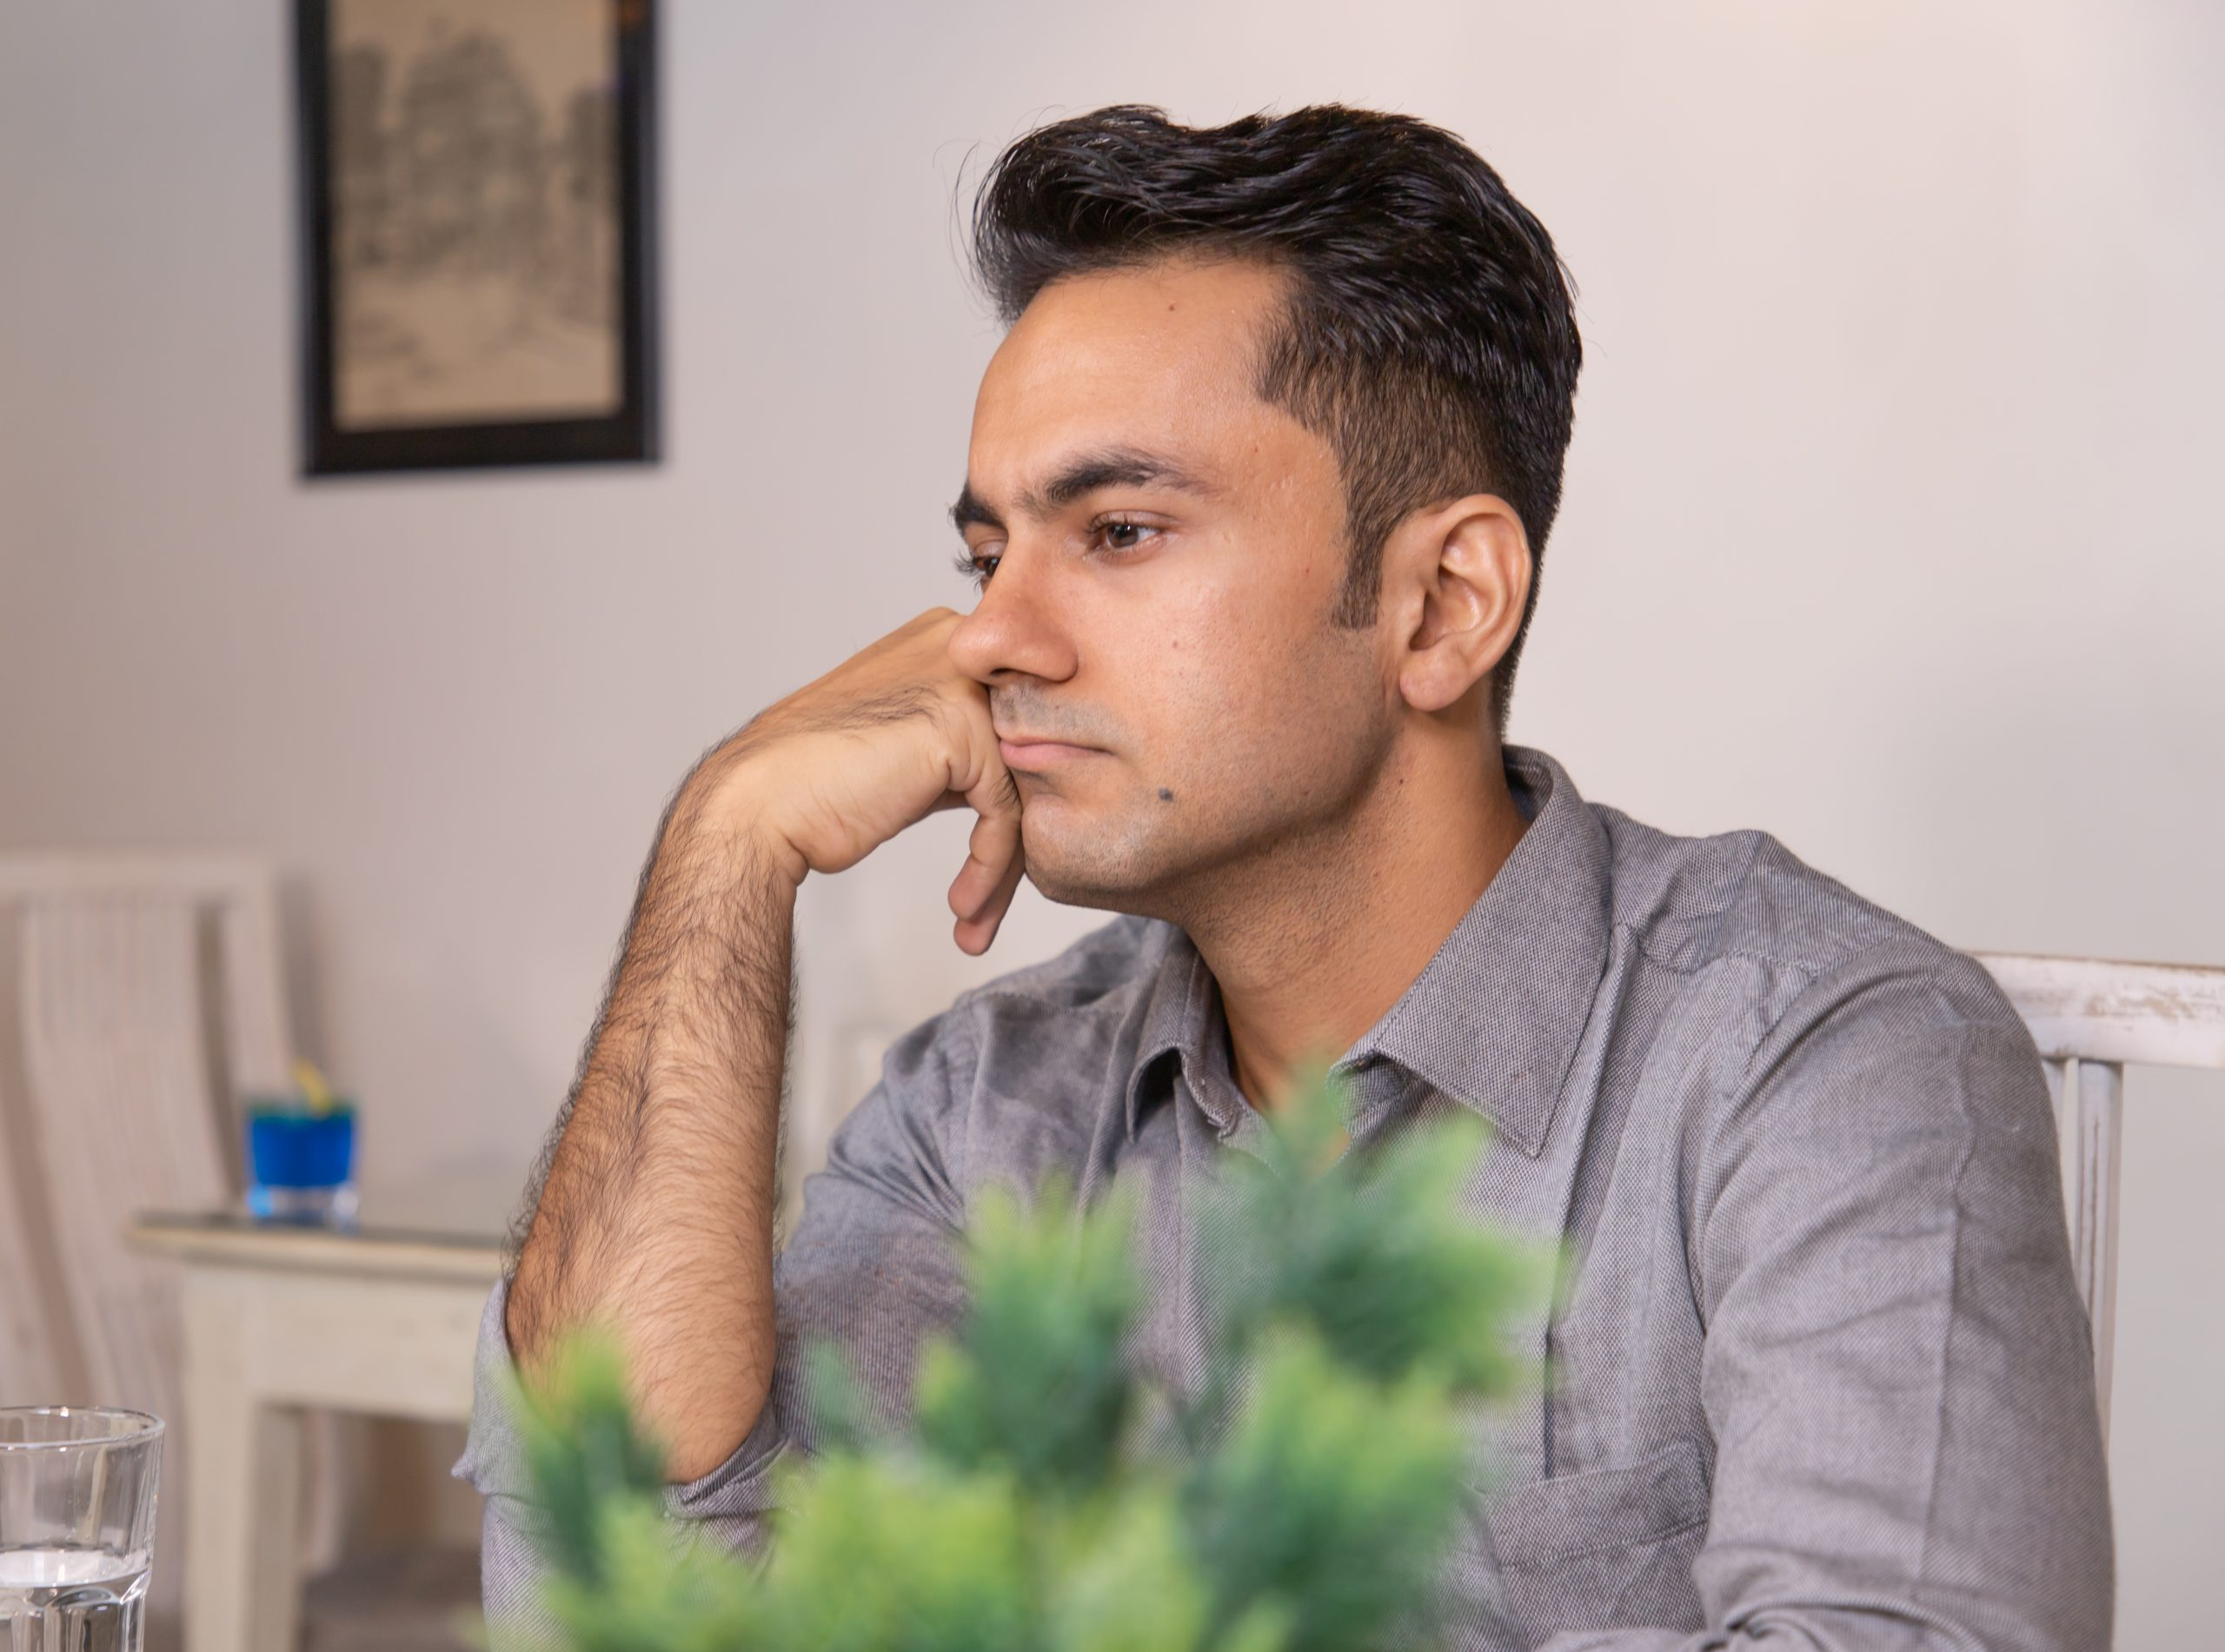 Sad looking man sitting in cafe